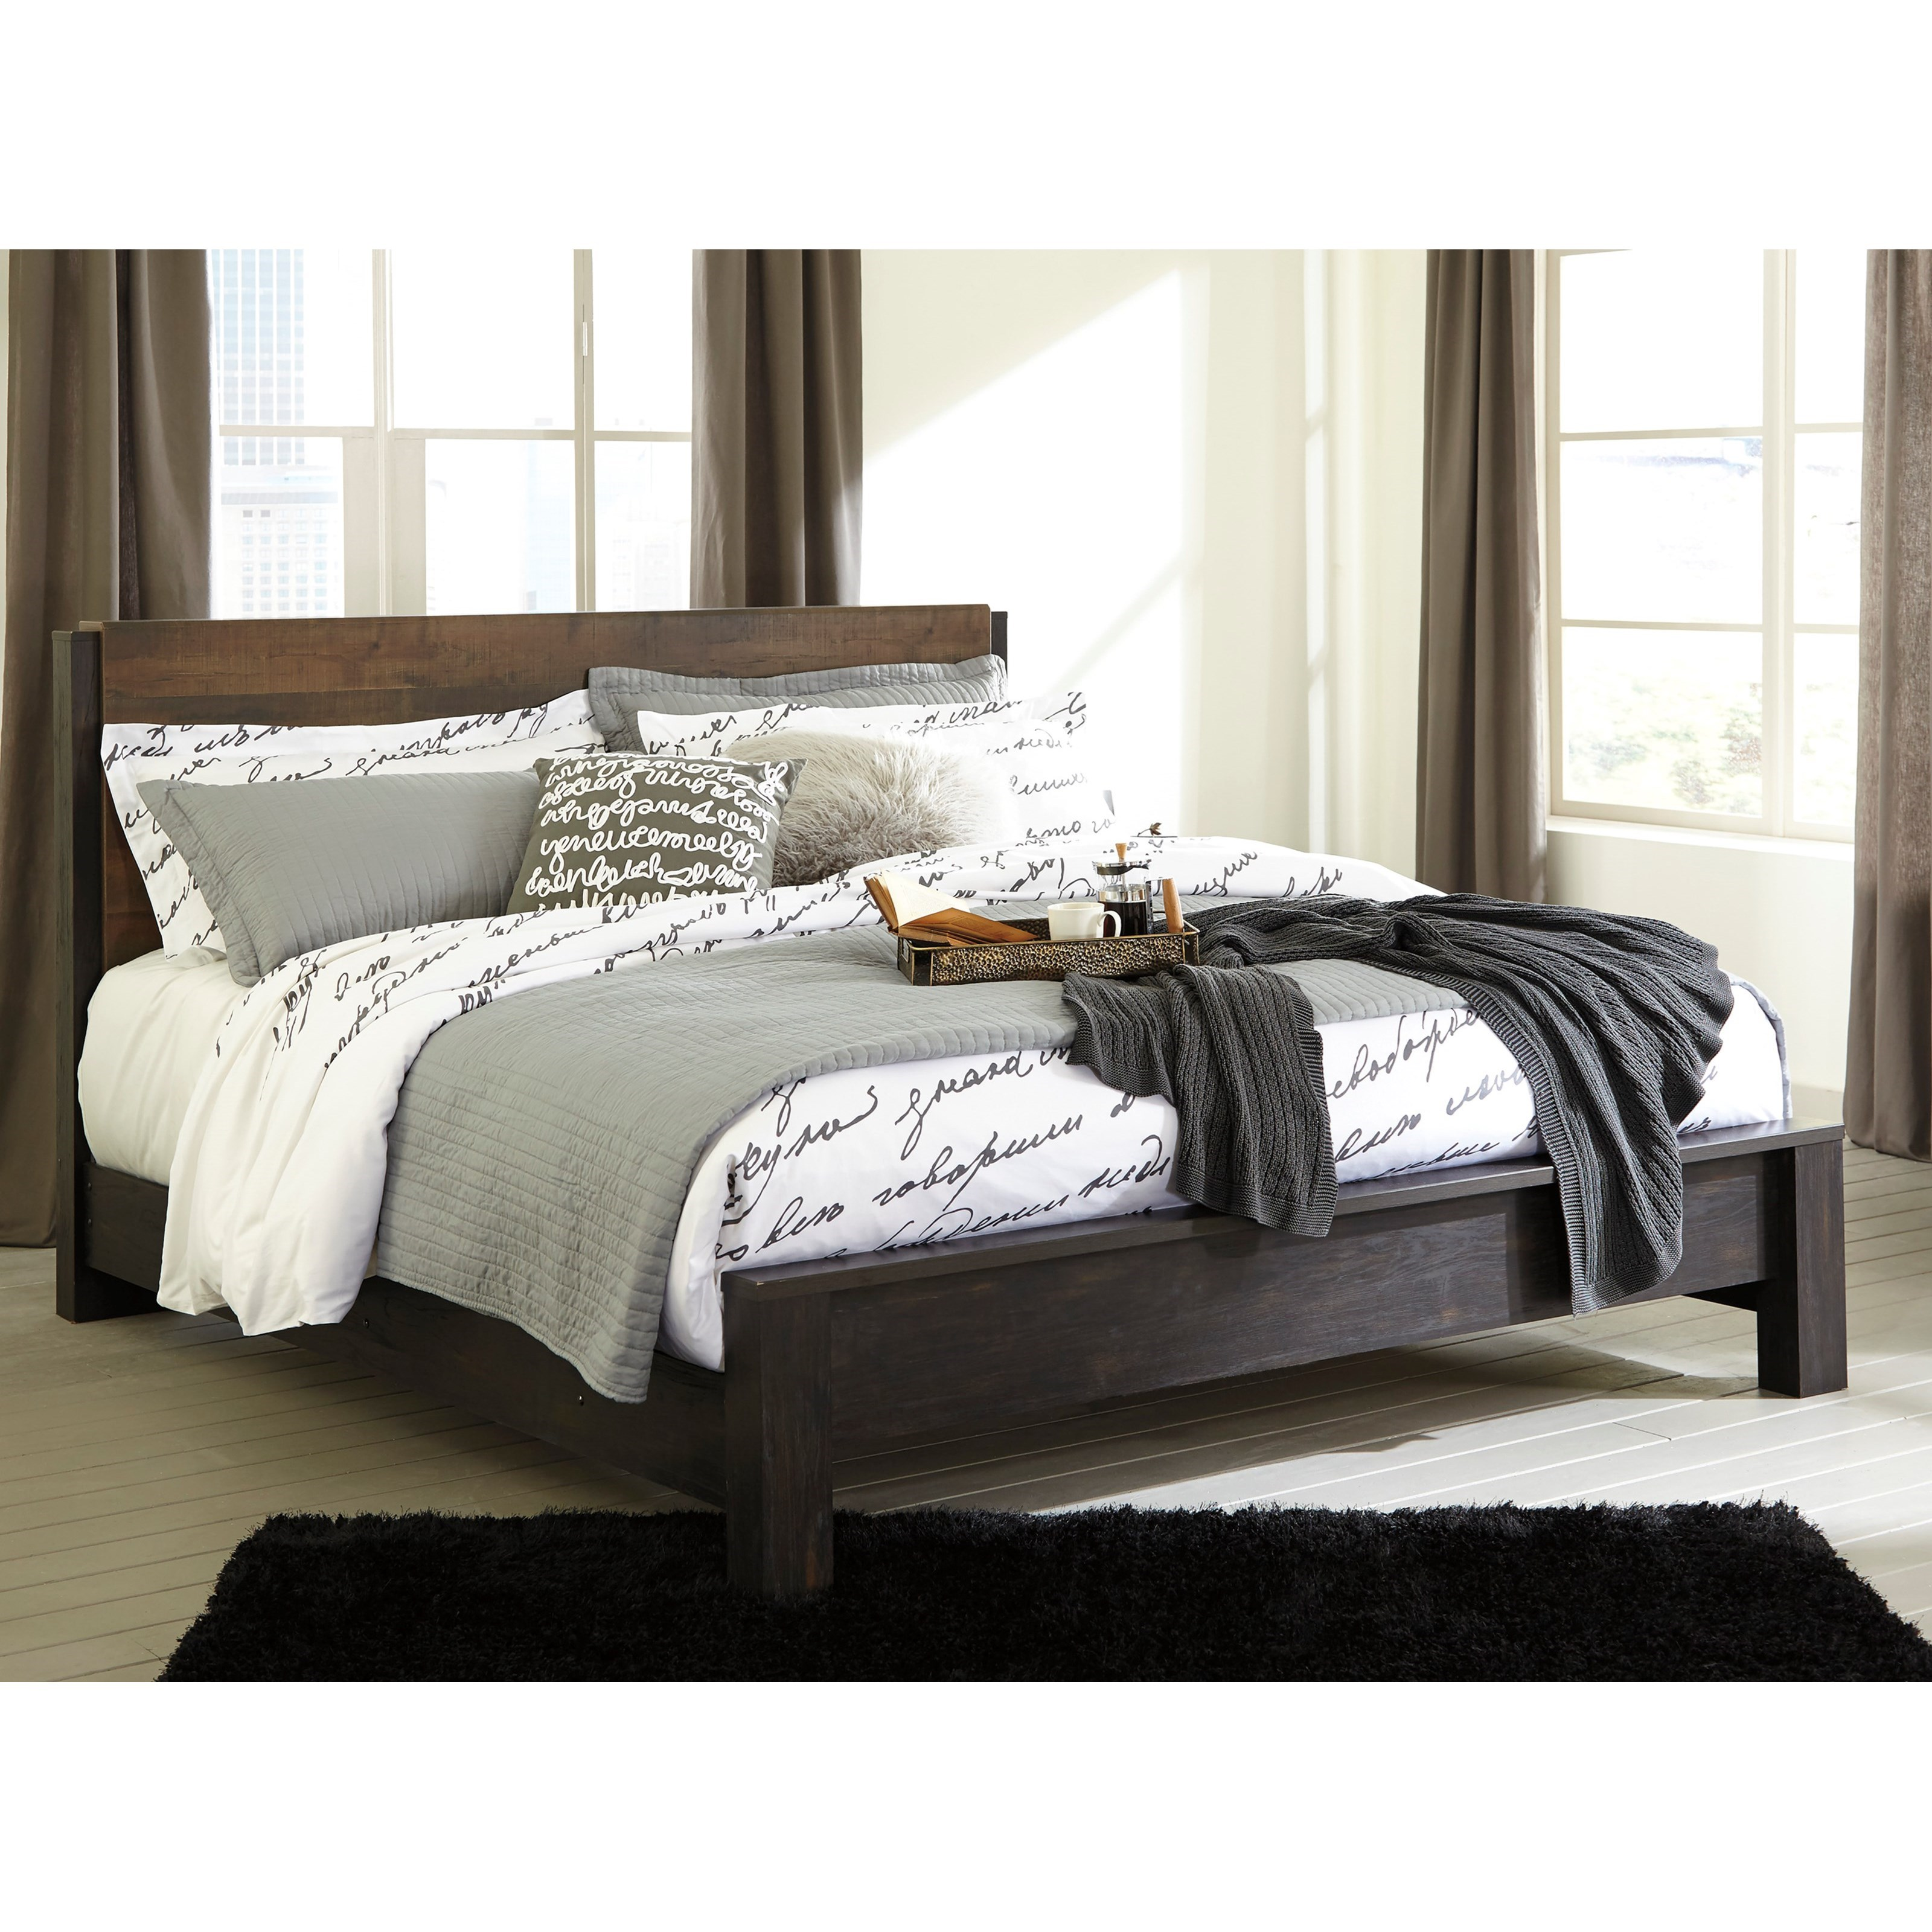 Ashley Furniture Beds: Ashley Signature Design Windlore Modern Rustic King Panel